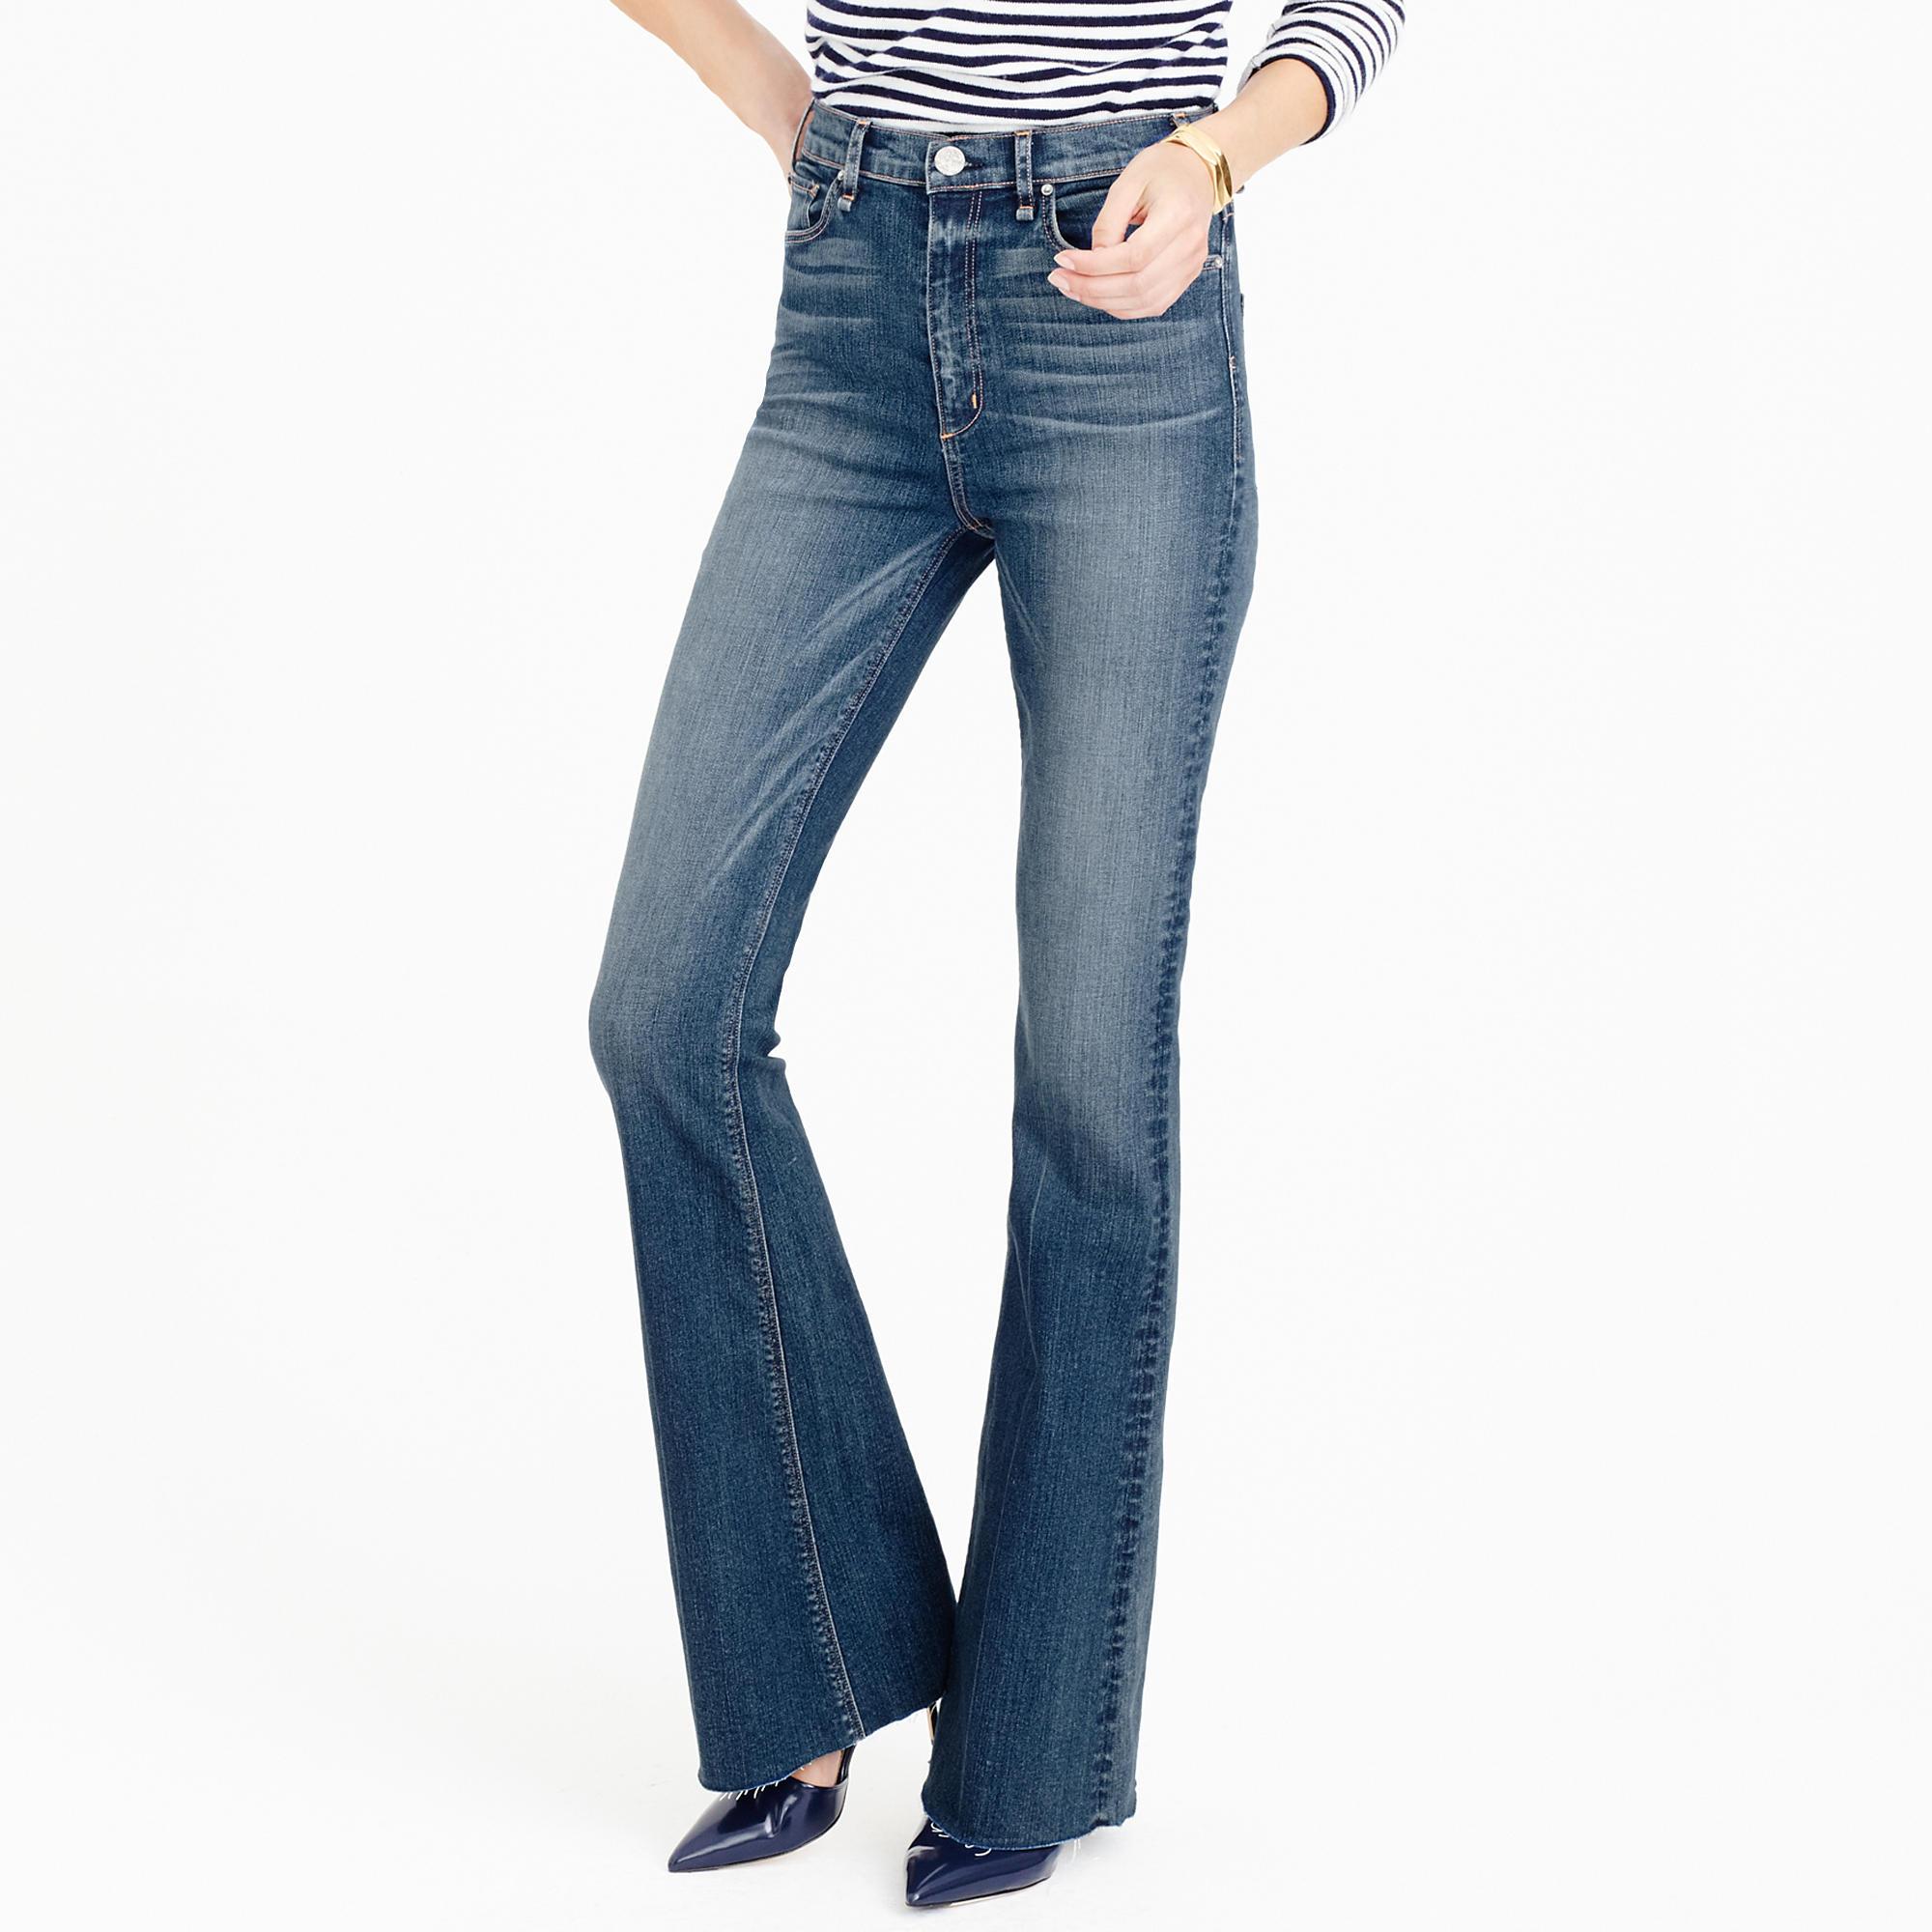 McGuire™ high-waisted flare jean : | J.Crew